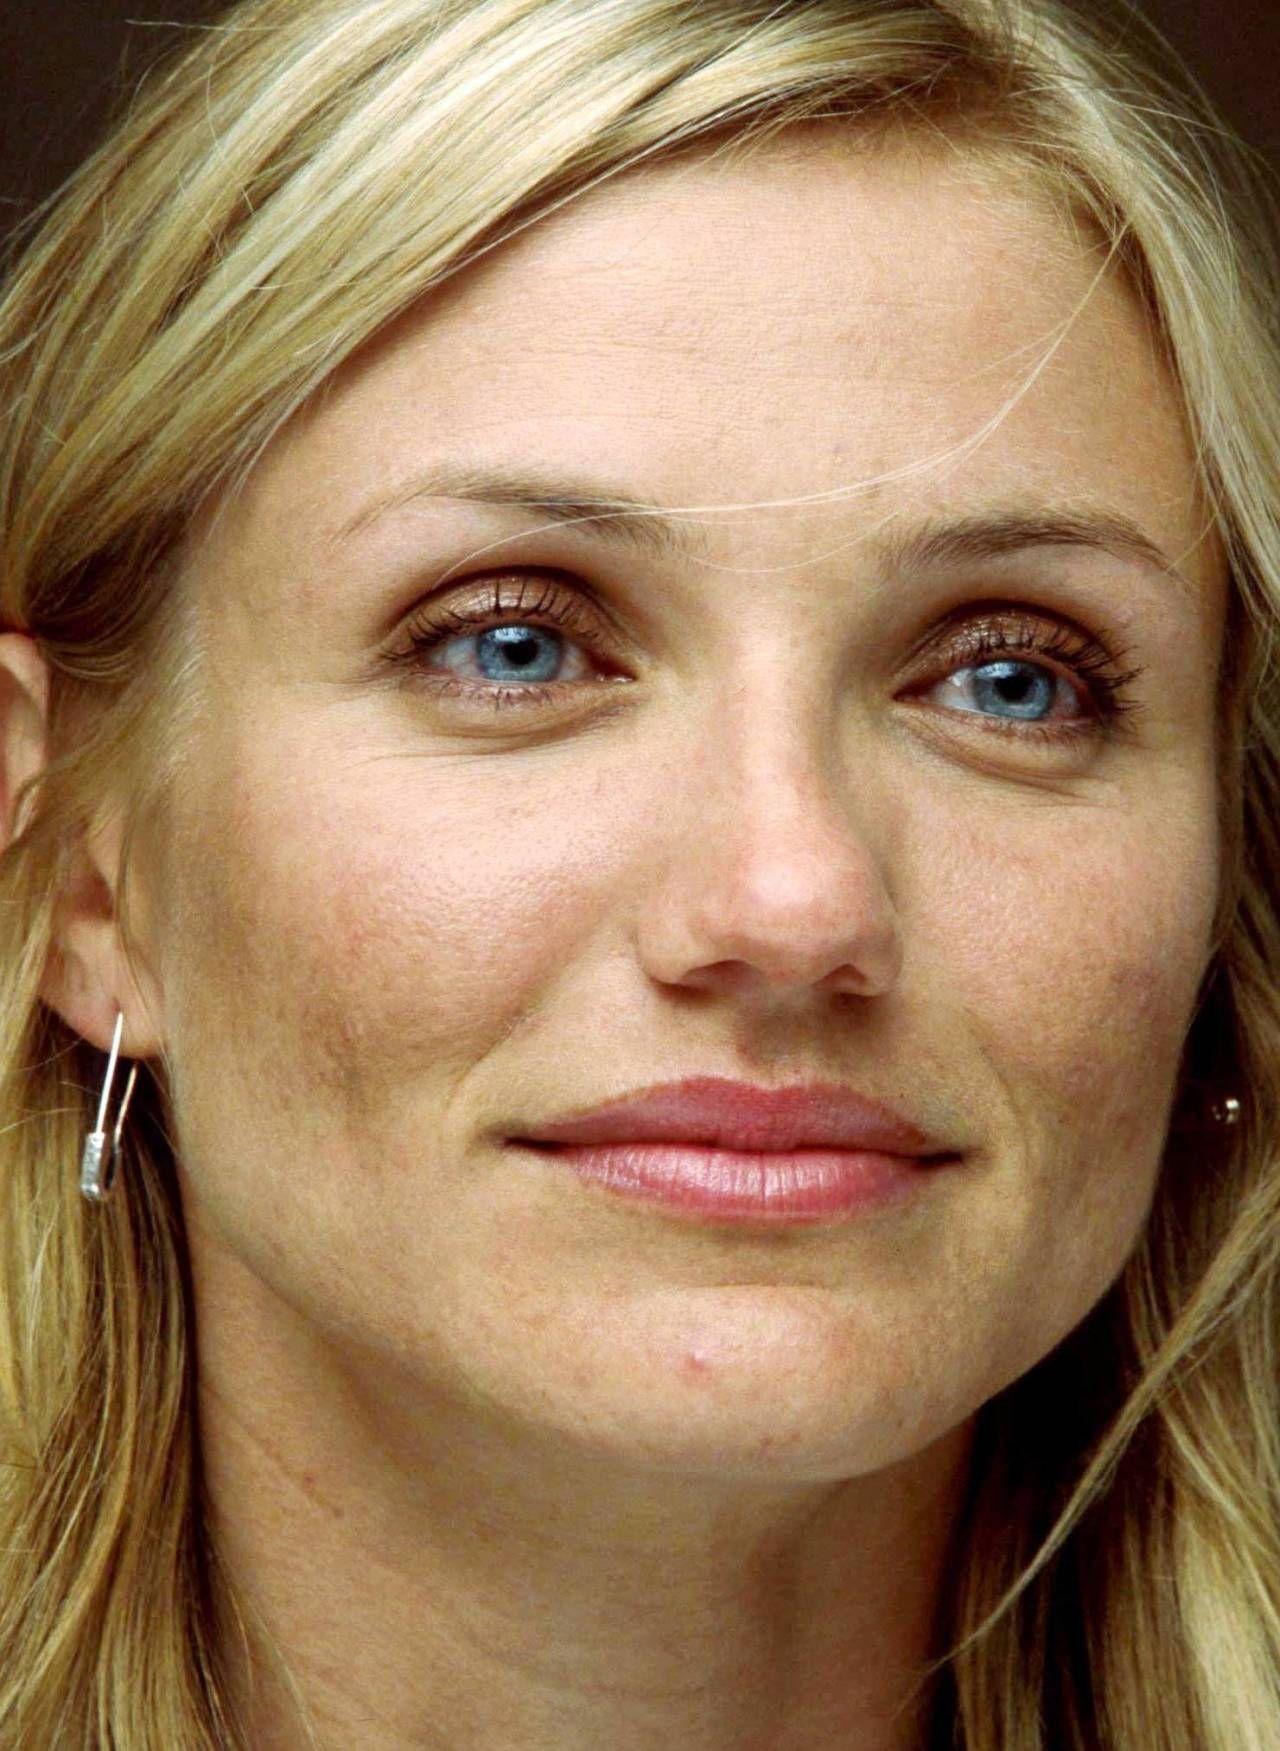 Acne and facial hair female